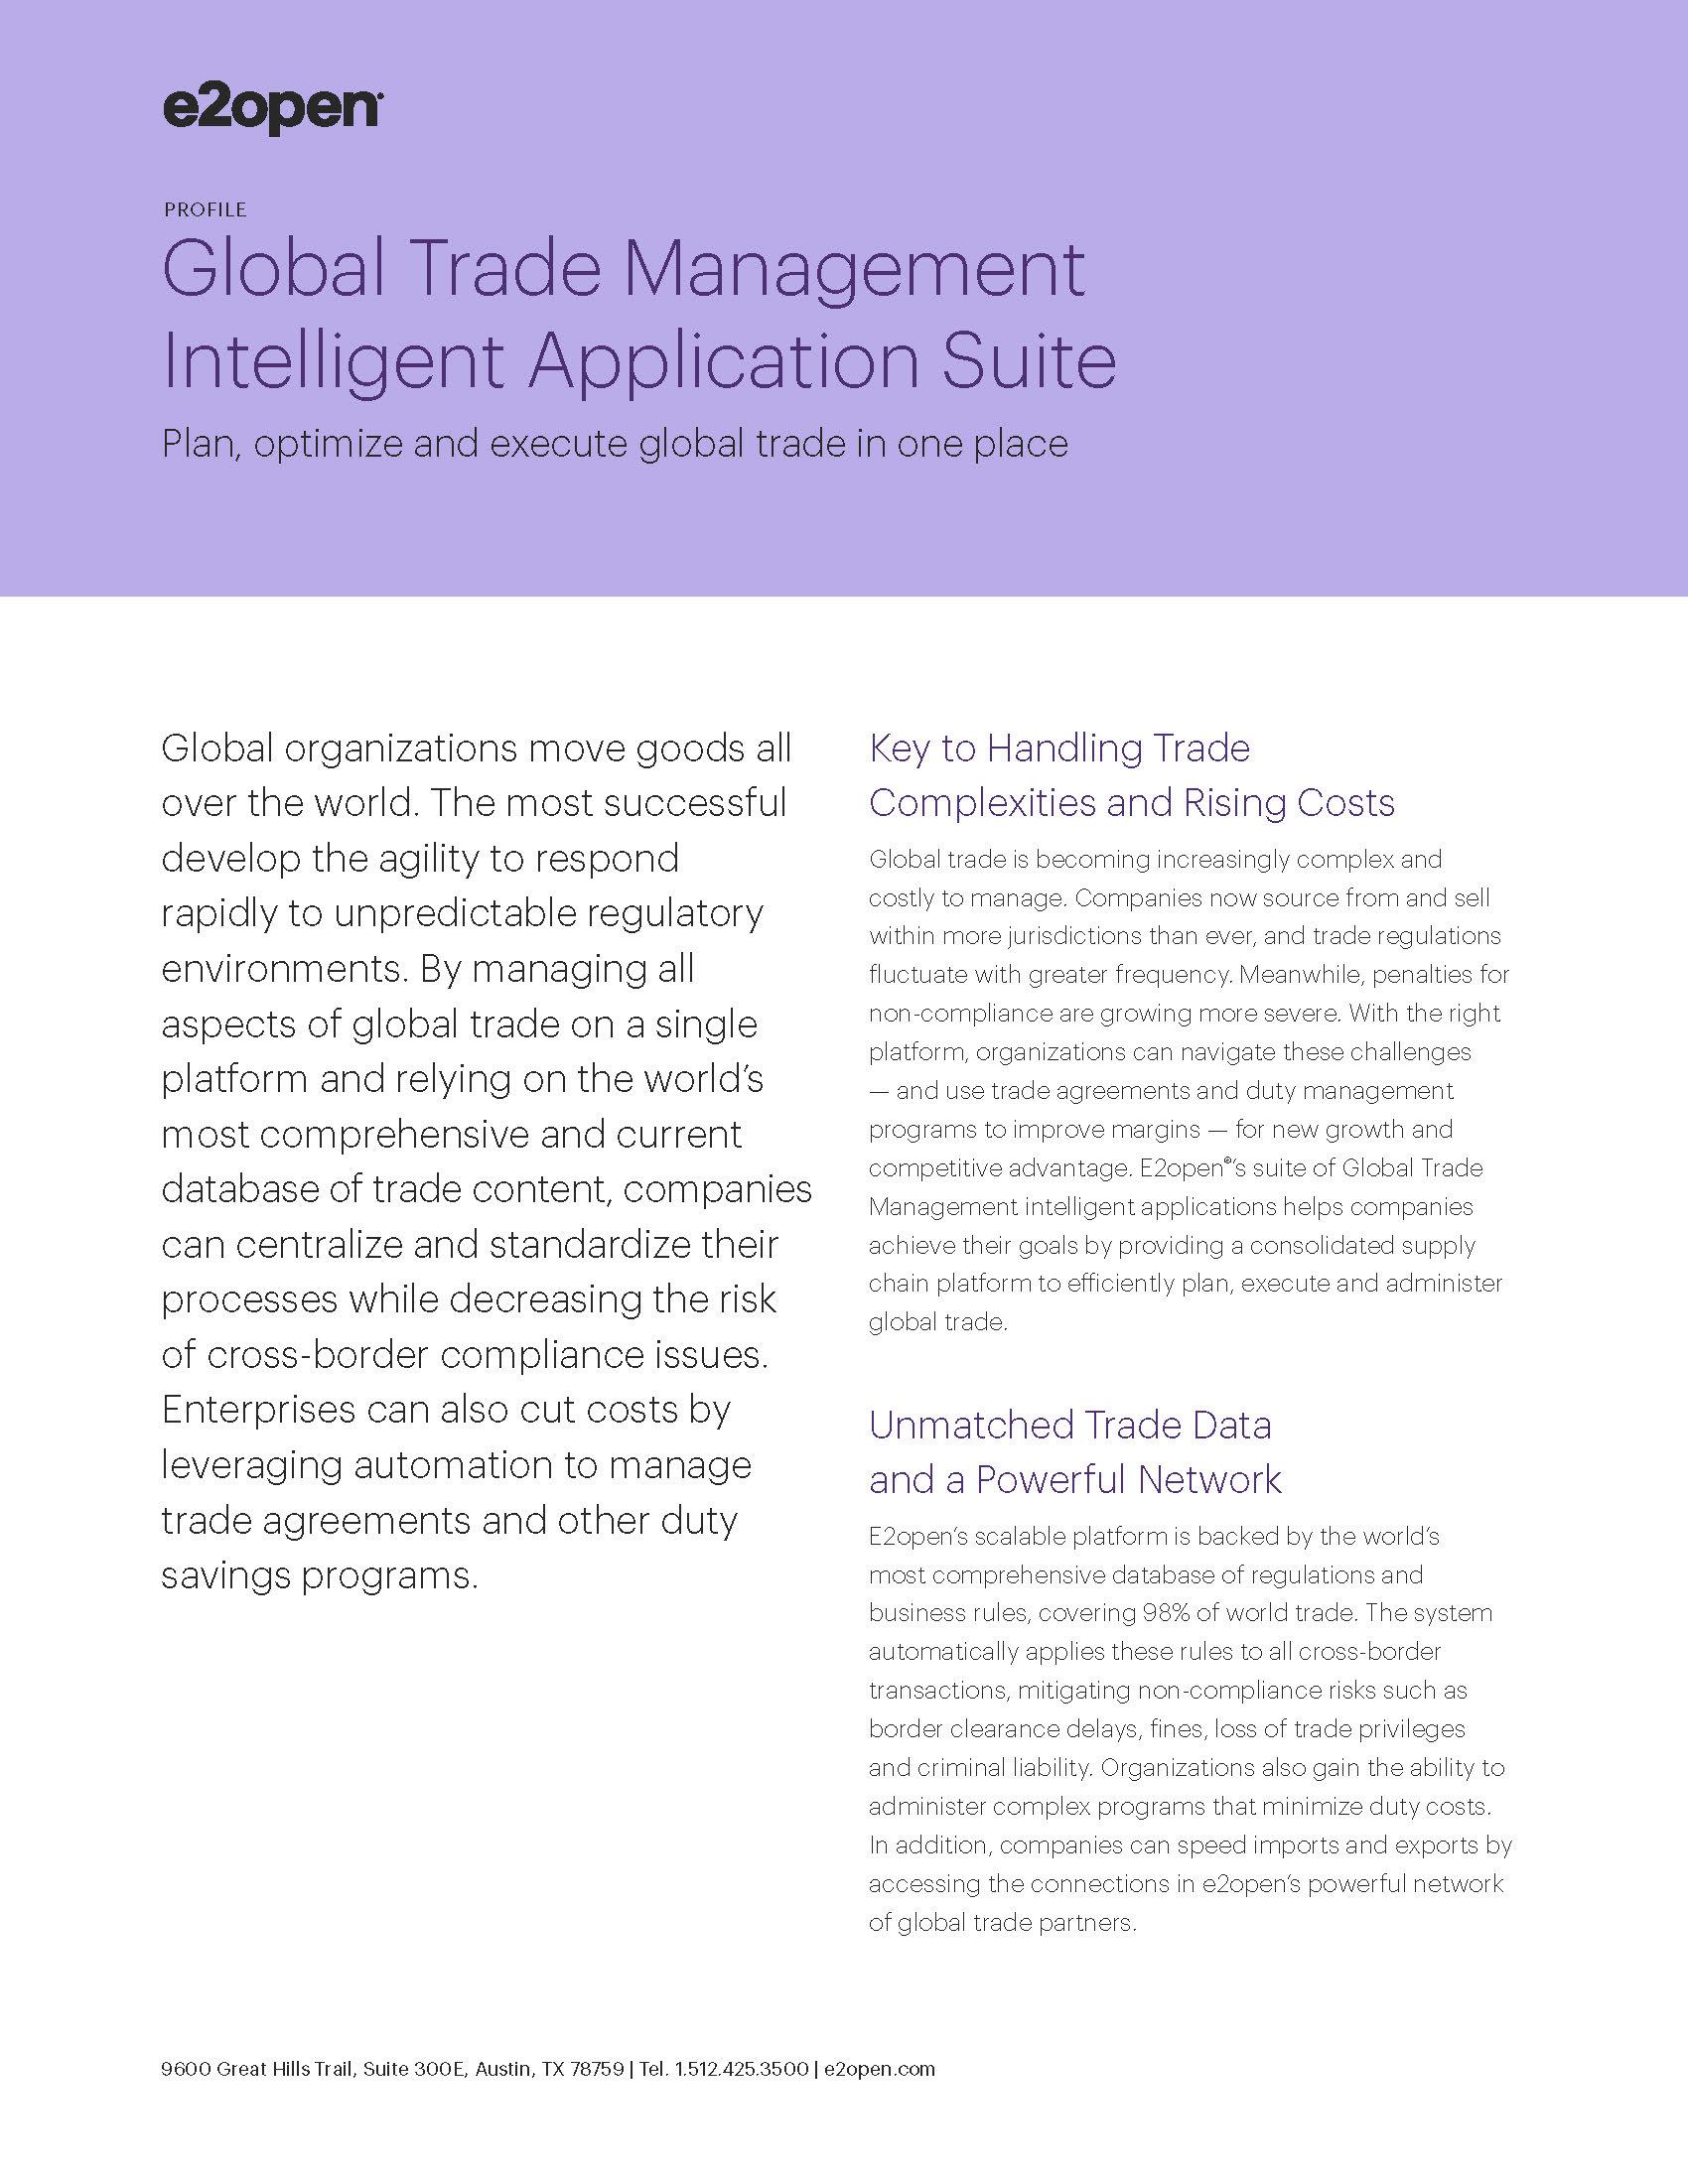 Global Trade Management Intelligent Application